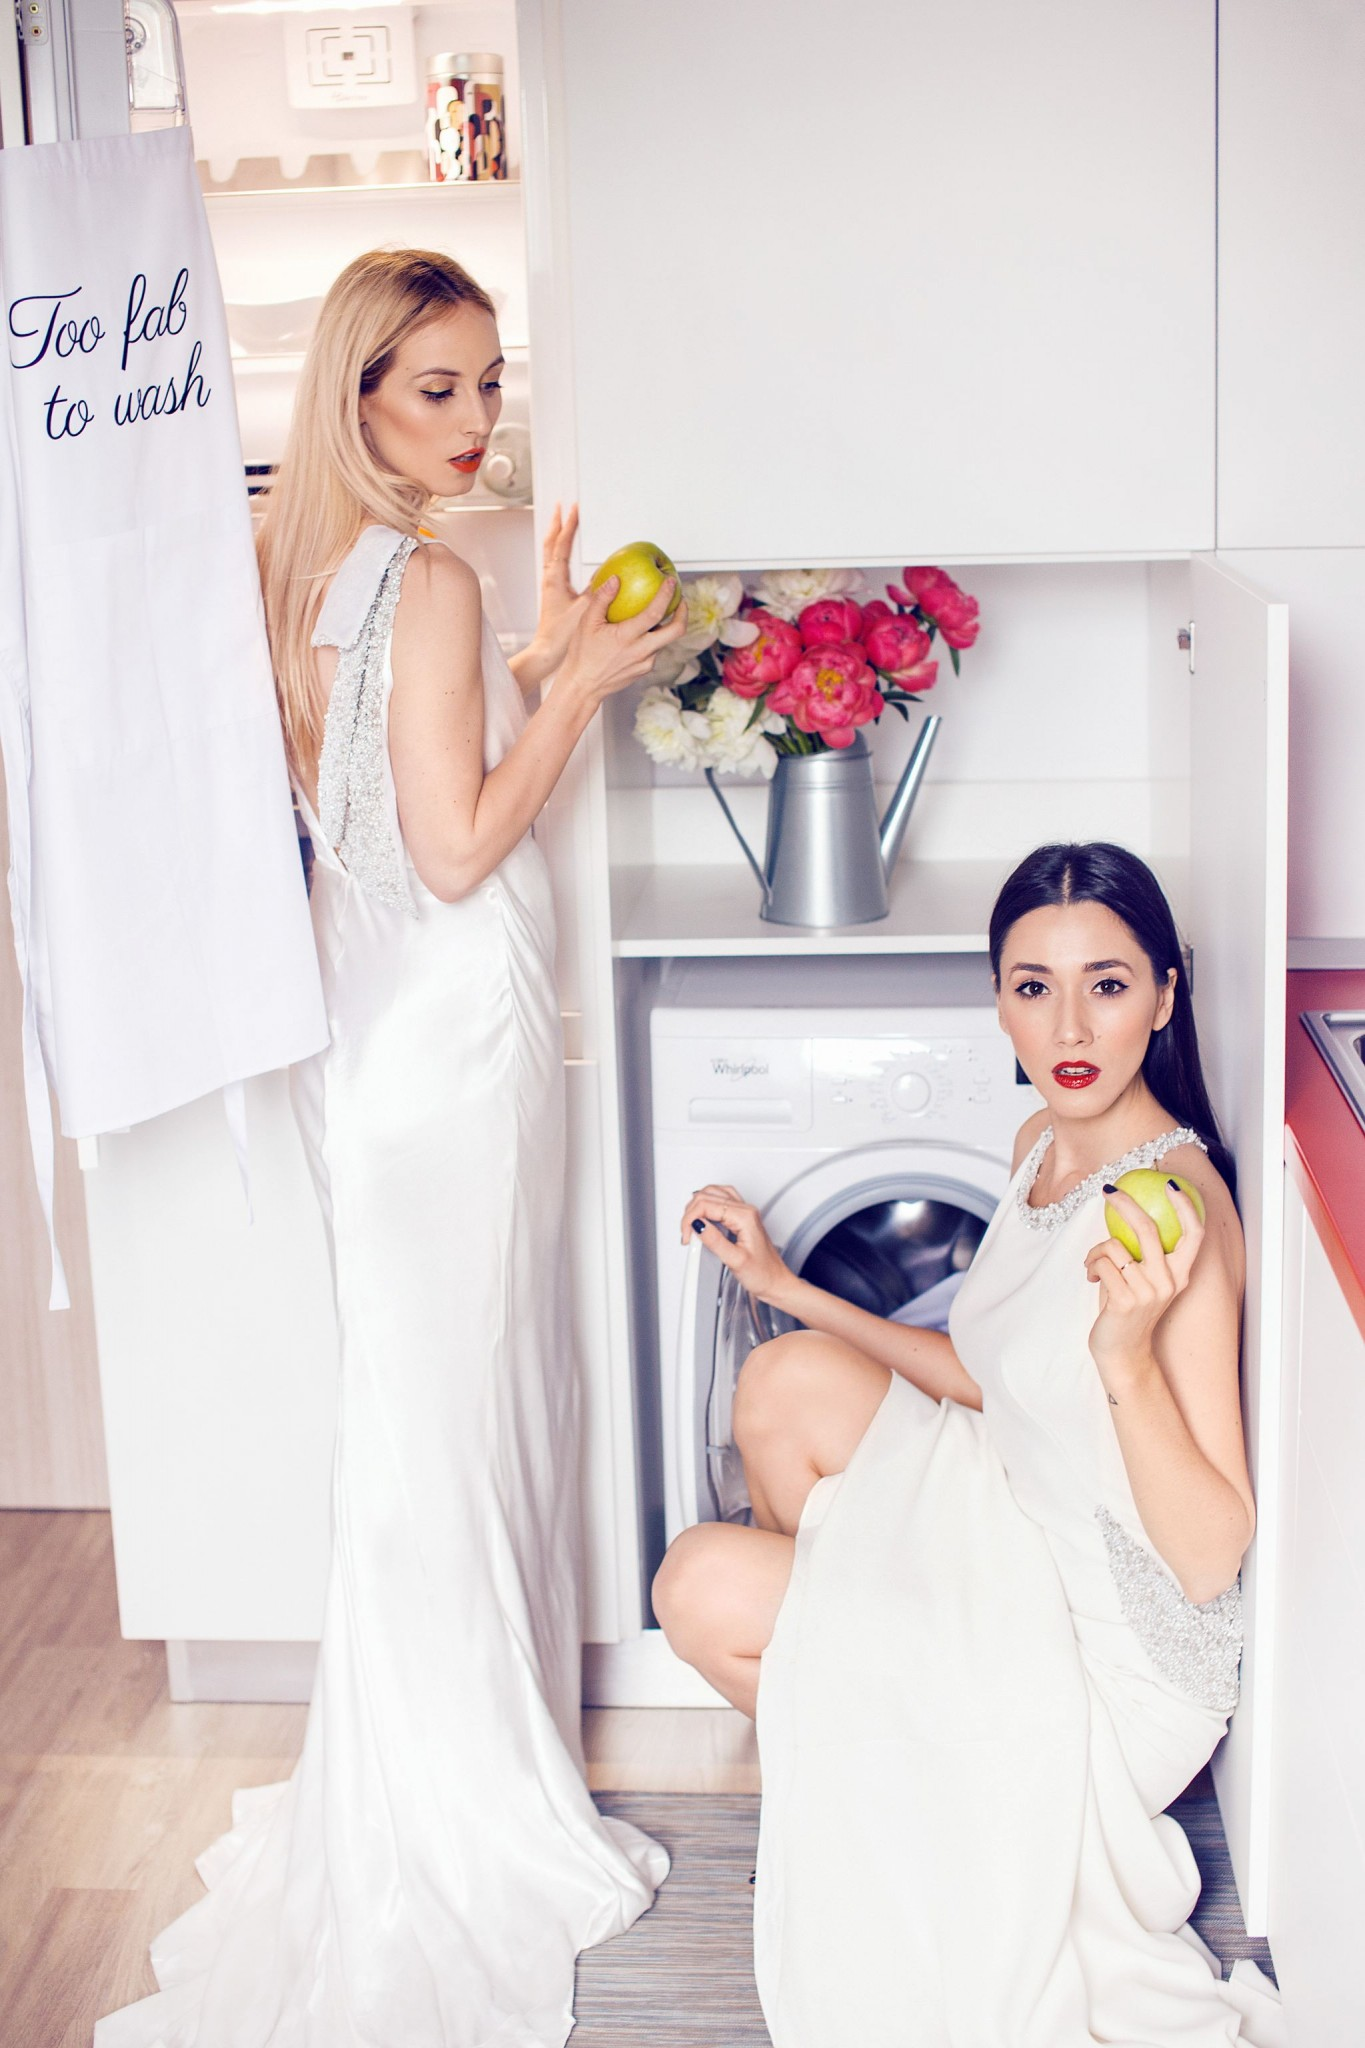 6Fabulous_Muses_Cake_Cooking_Whirlpool_Diana_Enciu_Alina_Tanasa_Parlor_retete_dulciuri